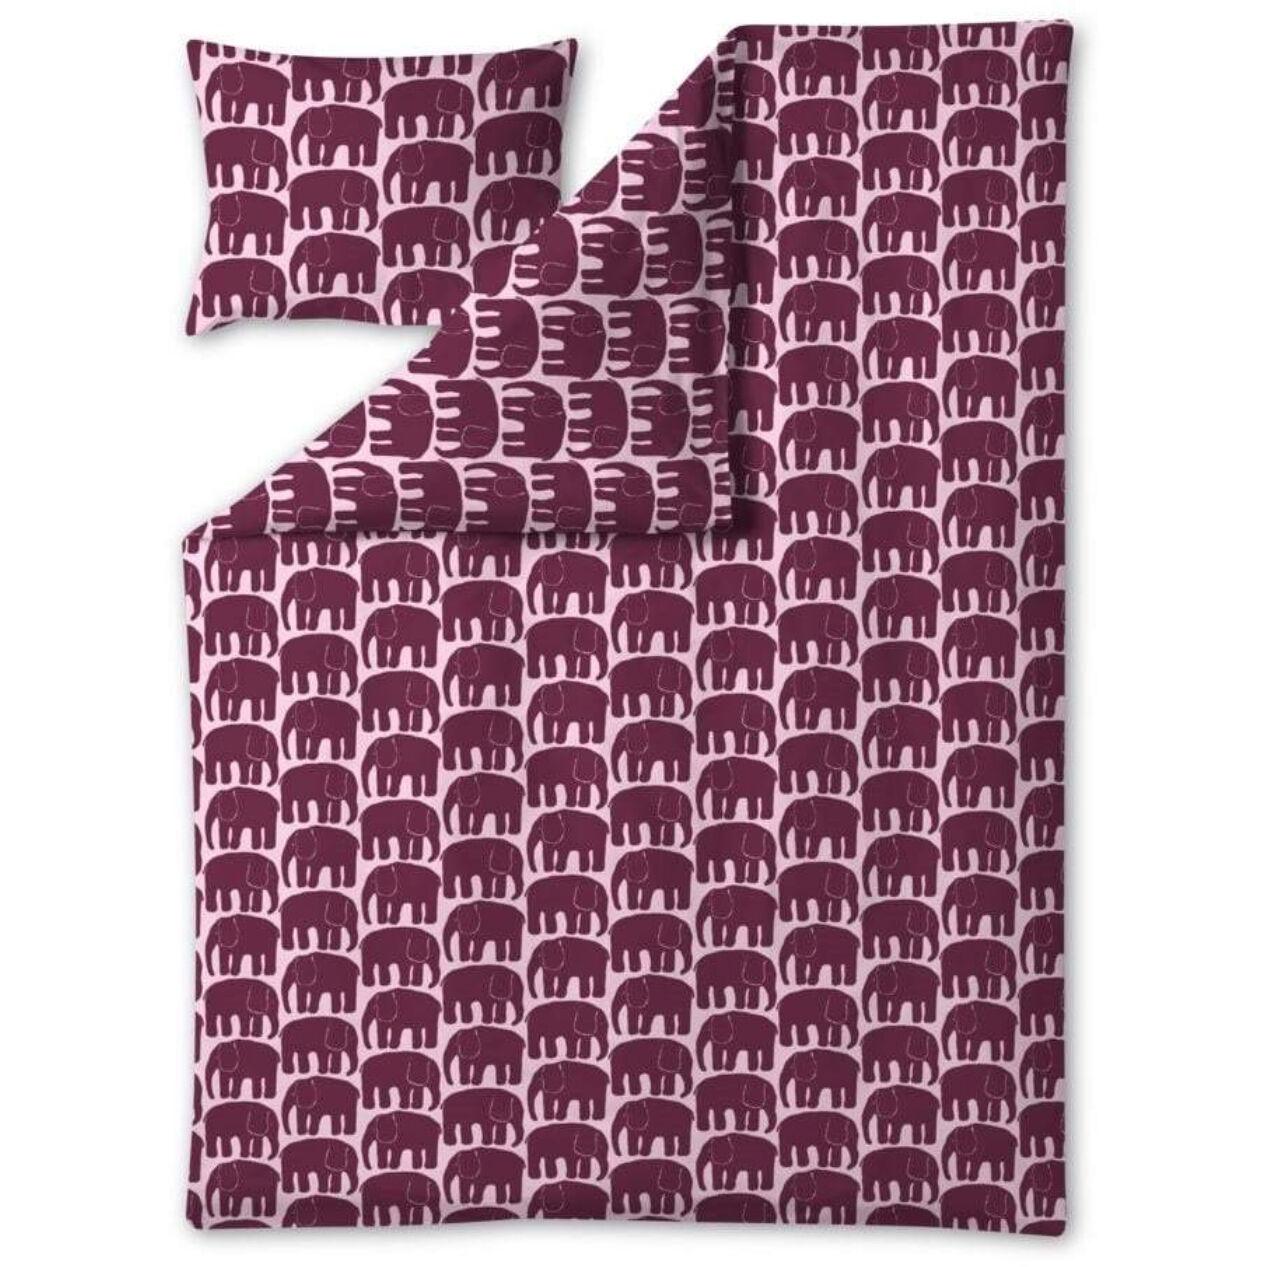 Finlayson Elefantti Bedset 150x210 cm, Burgundy/Pink